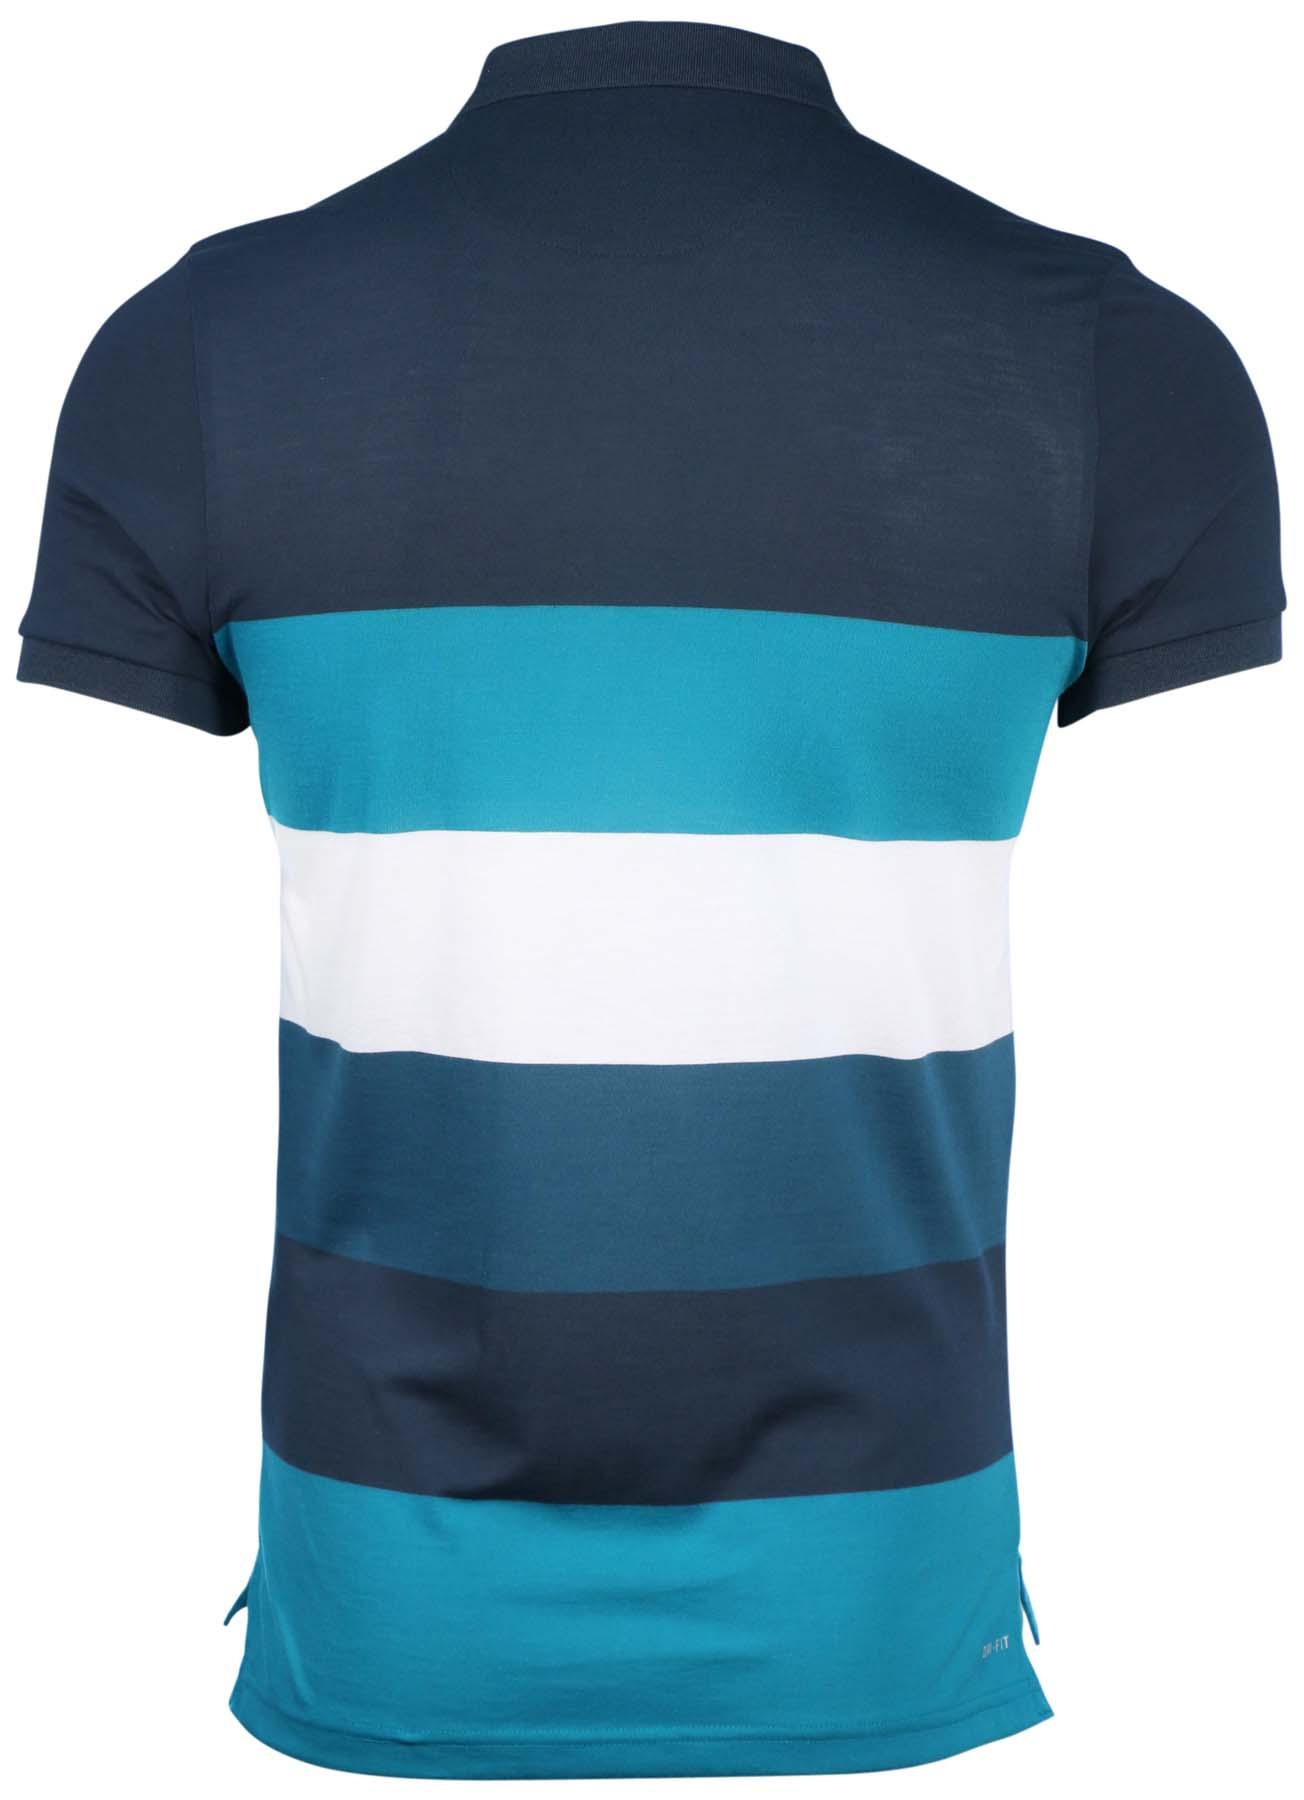 Nike Masculino Dri-Fit vantagem Camisa Polo Tênis legal  15f177c1a6e1b